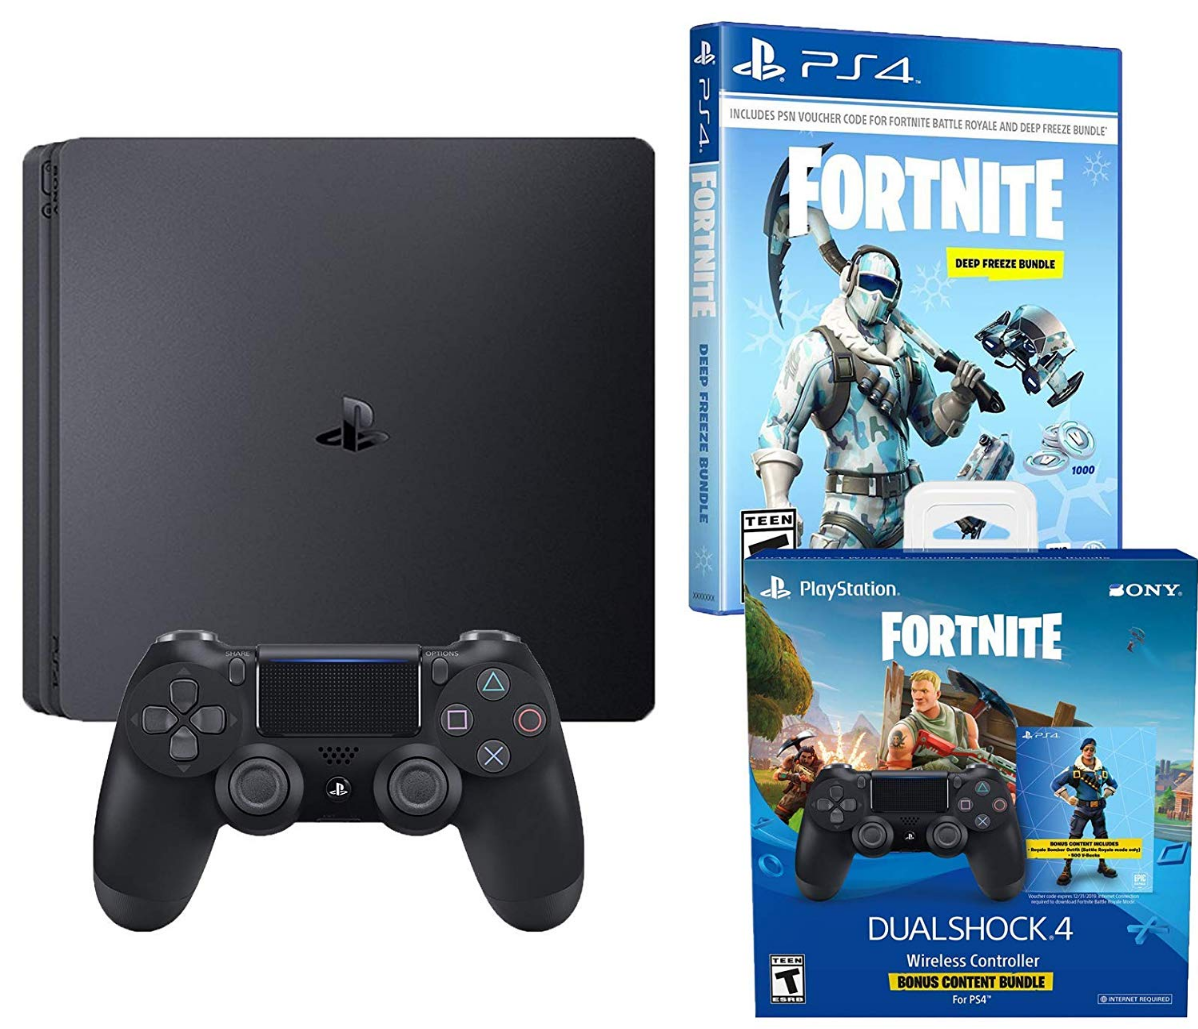 Playstation 4 Battle Royale Fortnite Frostbite and Royale